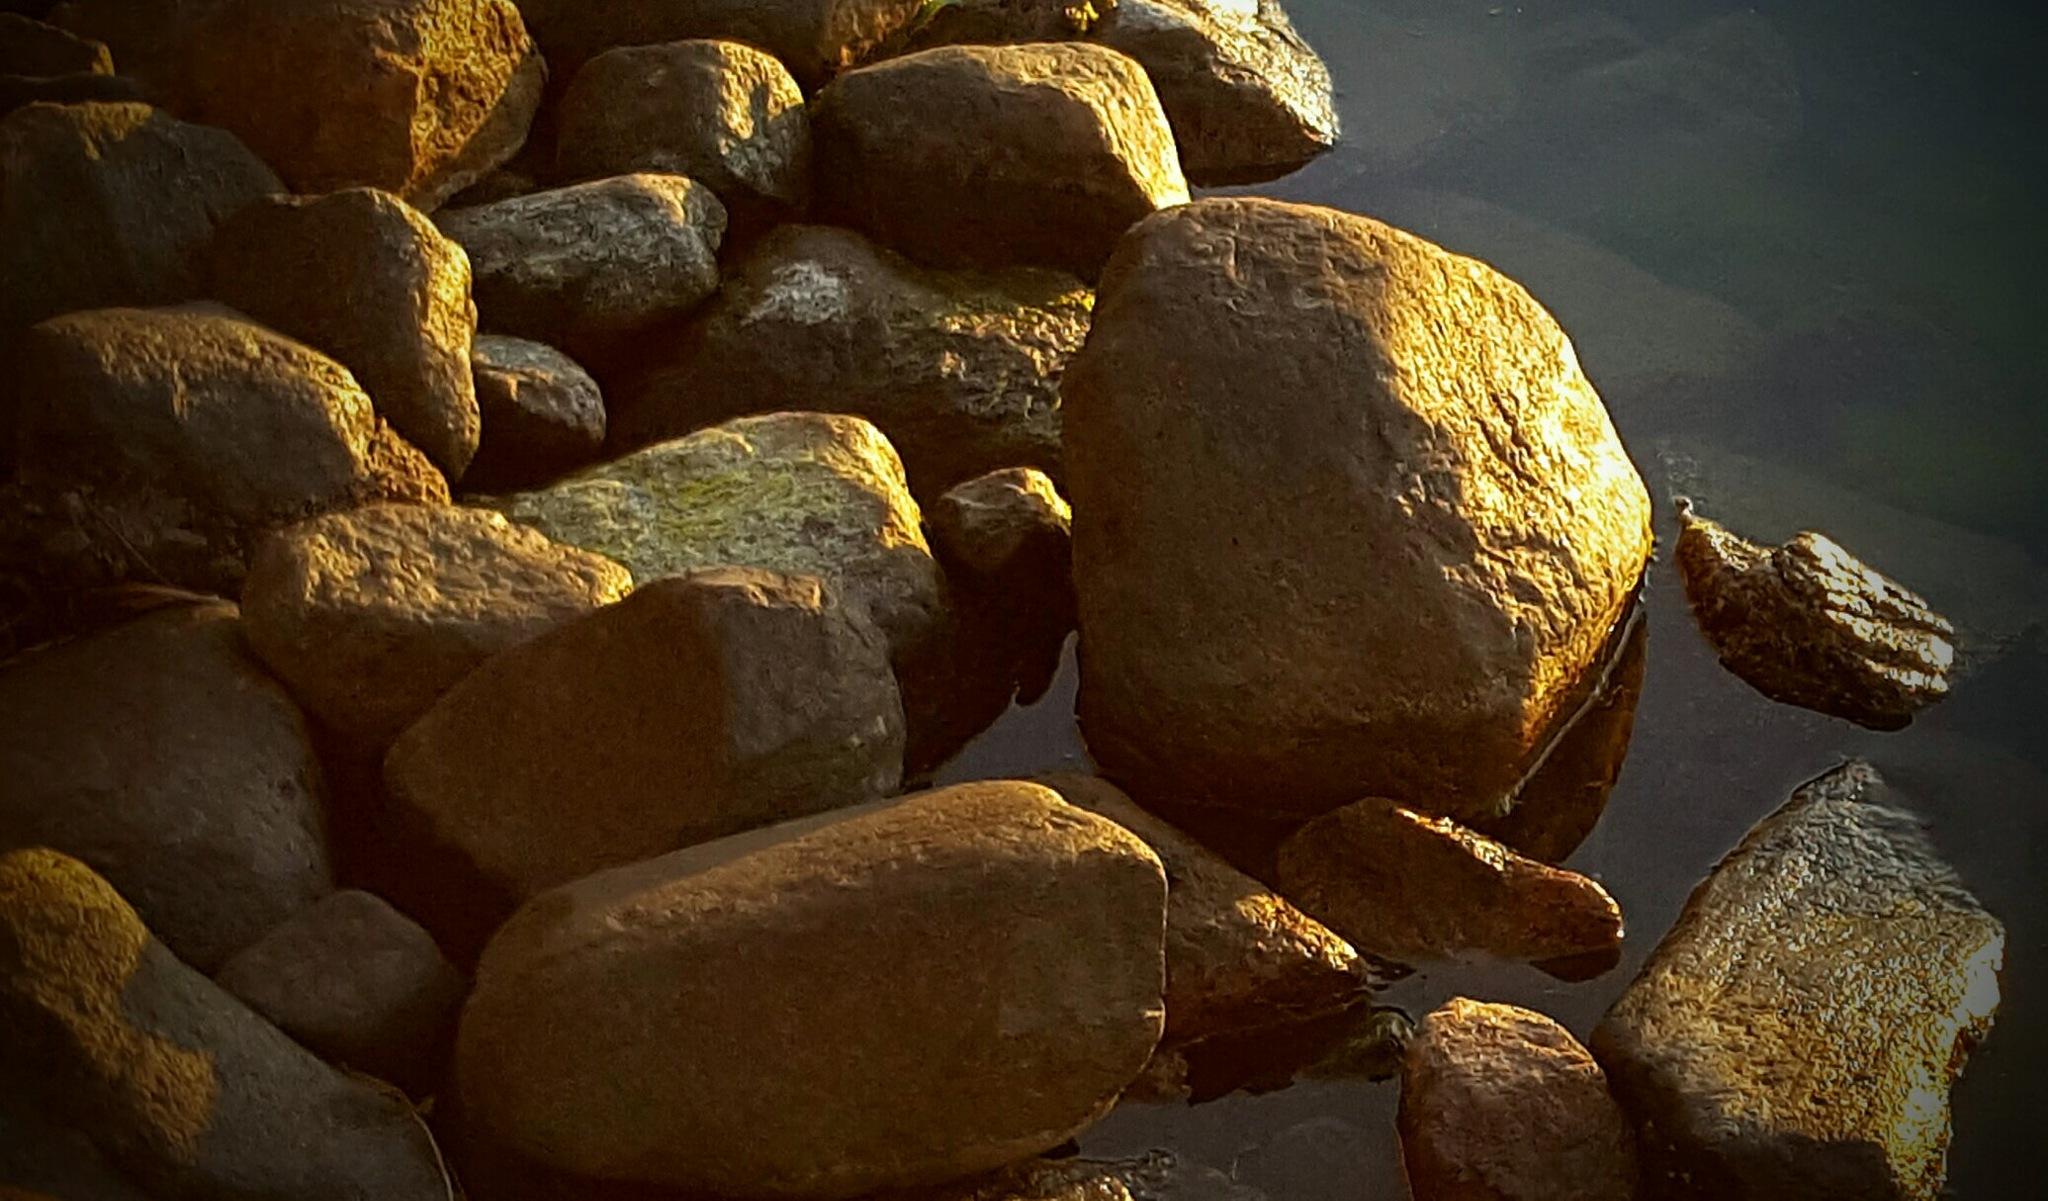 Sunbathing stones by Susanne Brännström